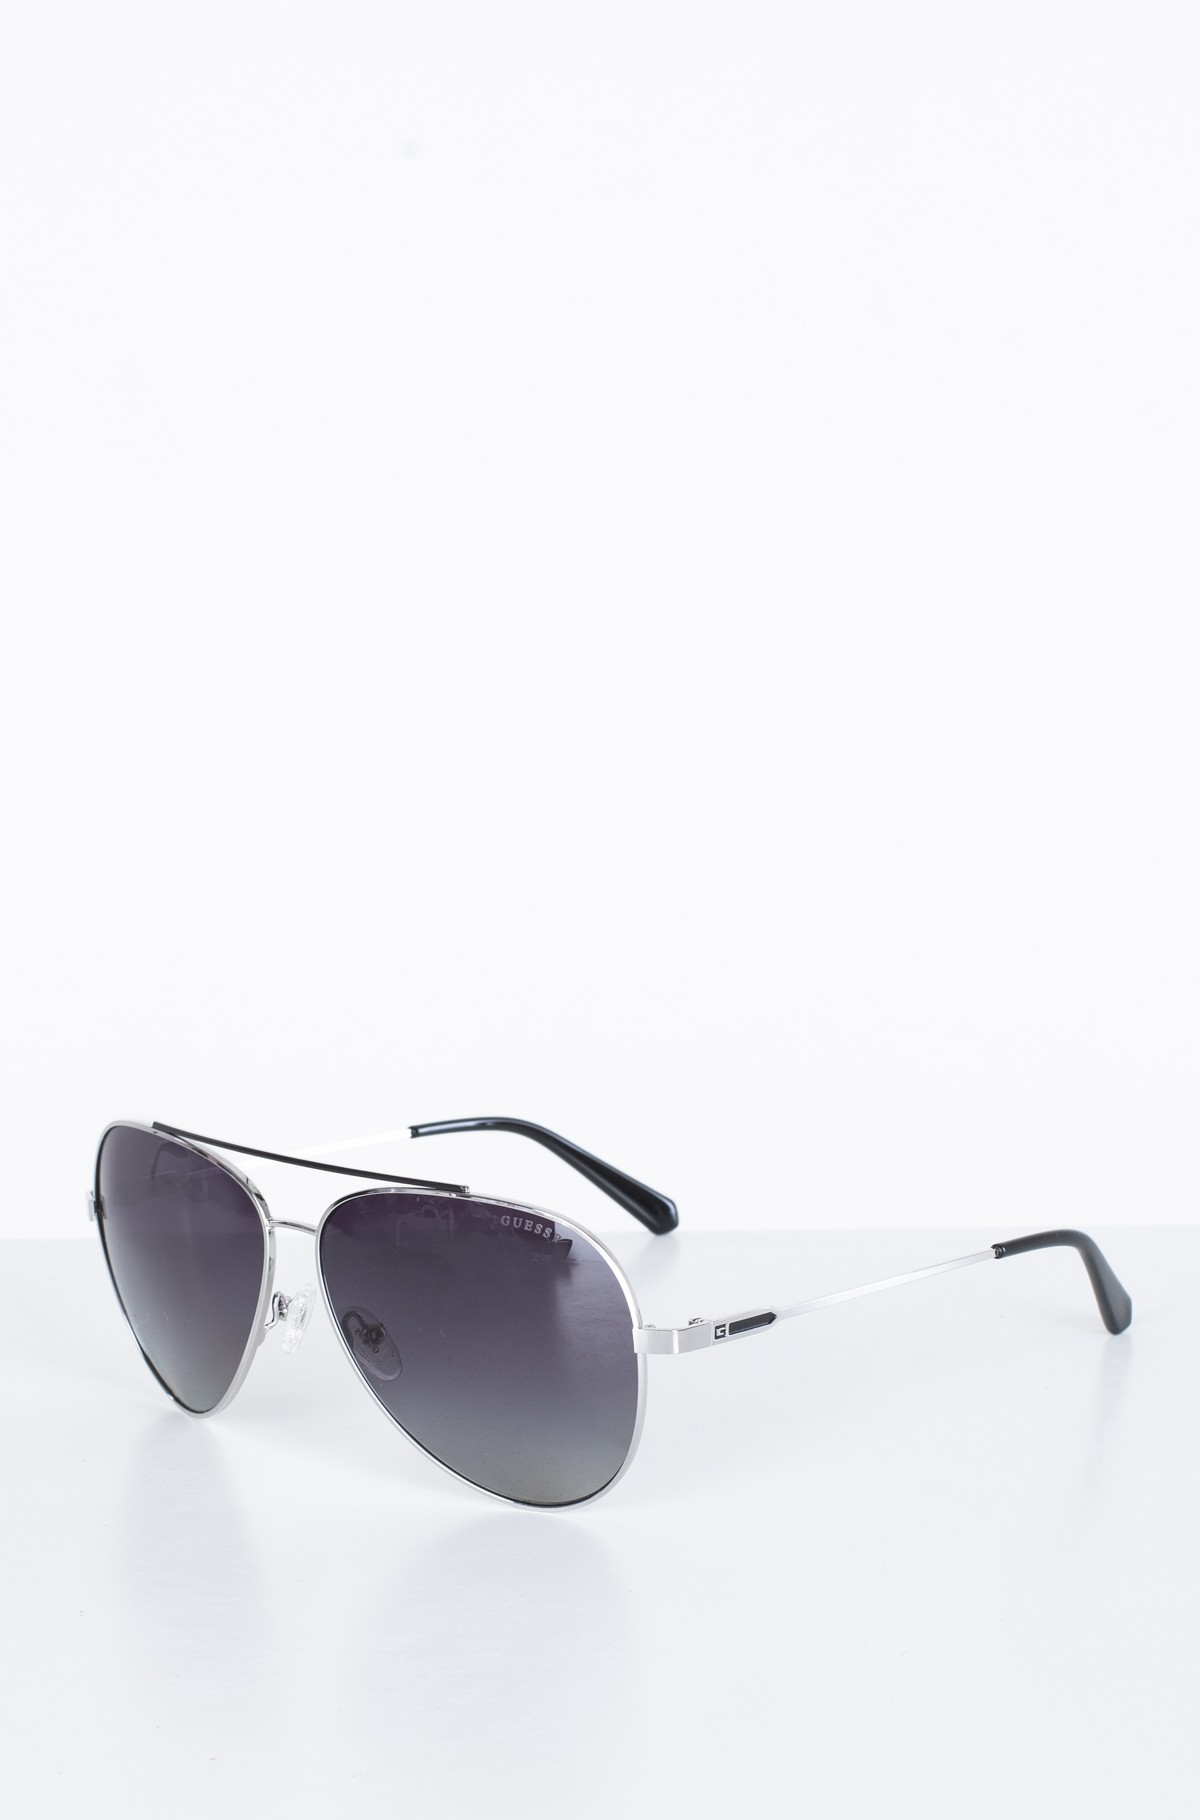 Sunglasses 6972-full-2